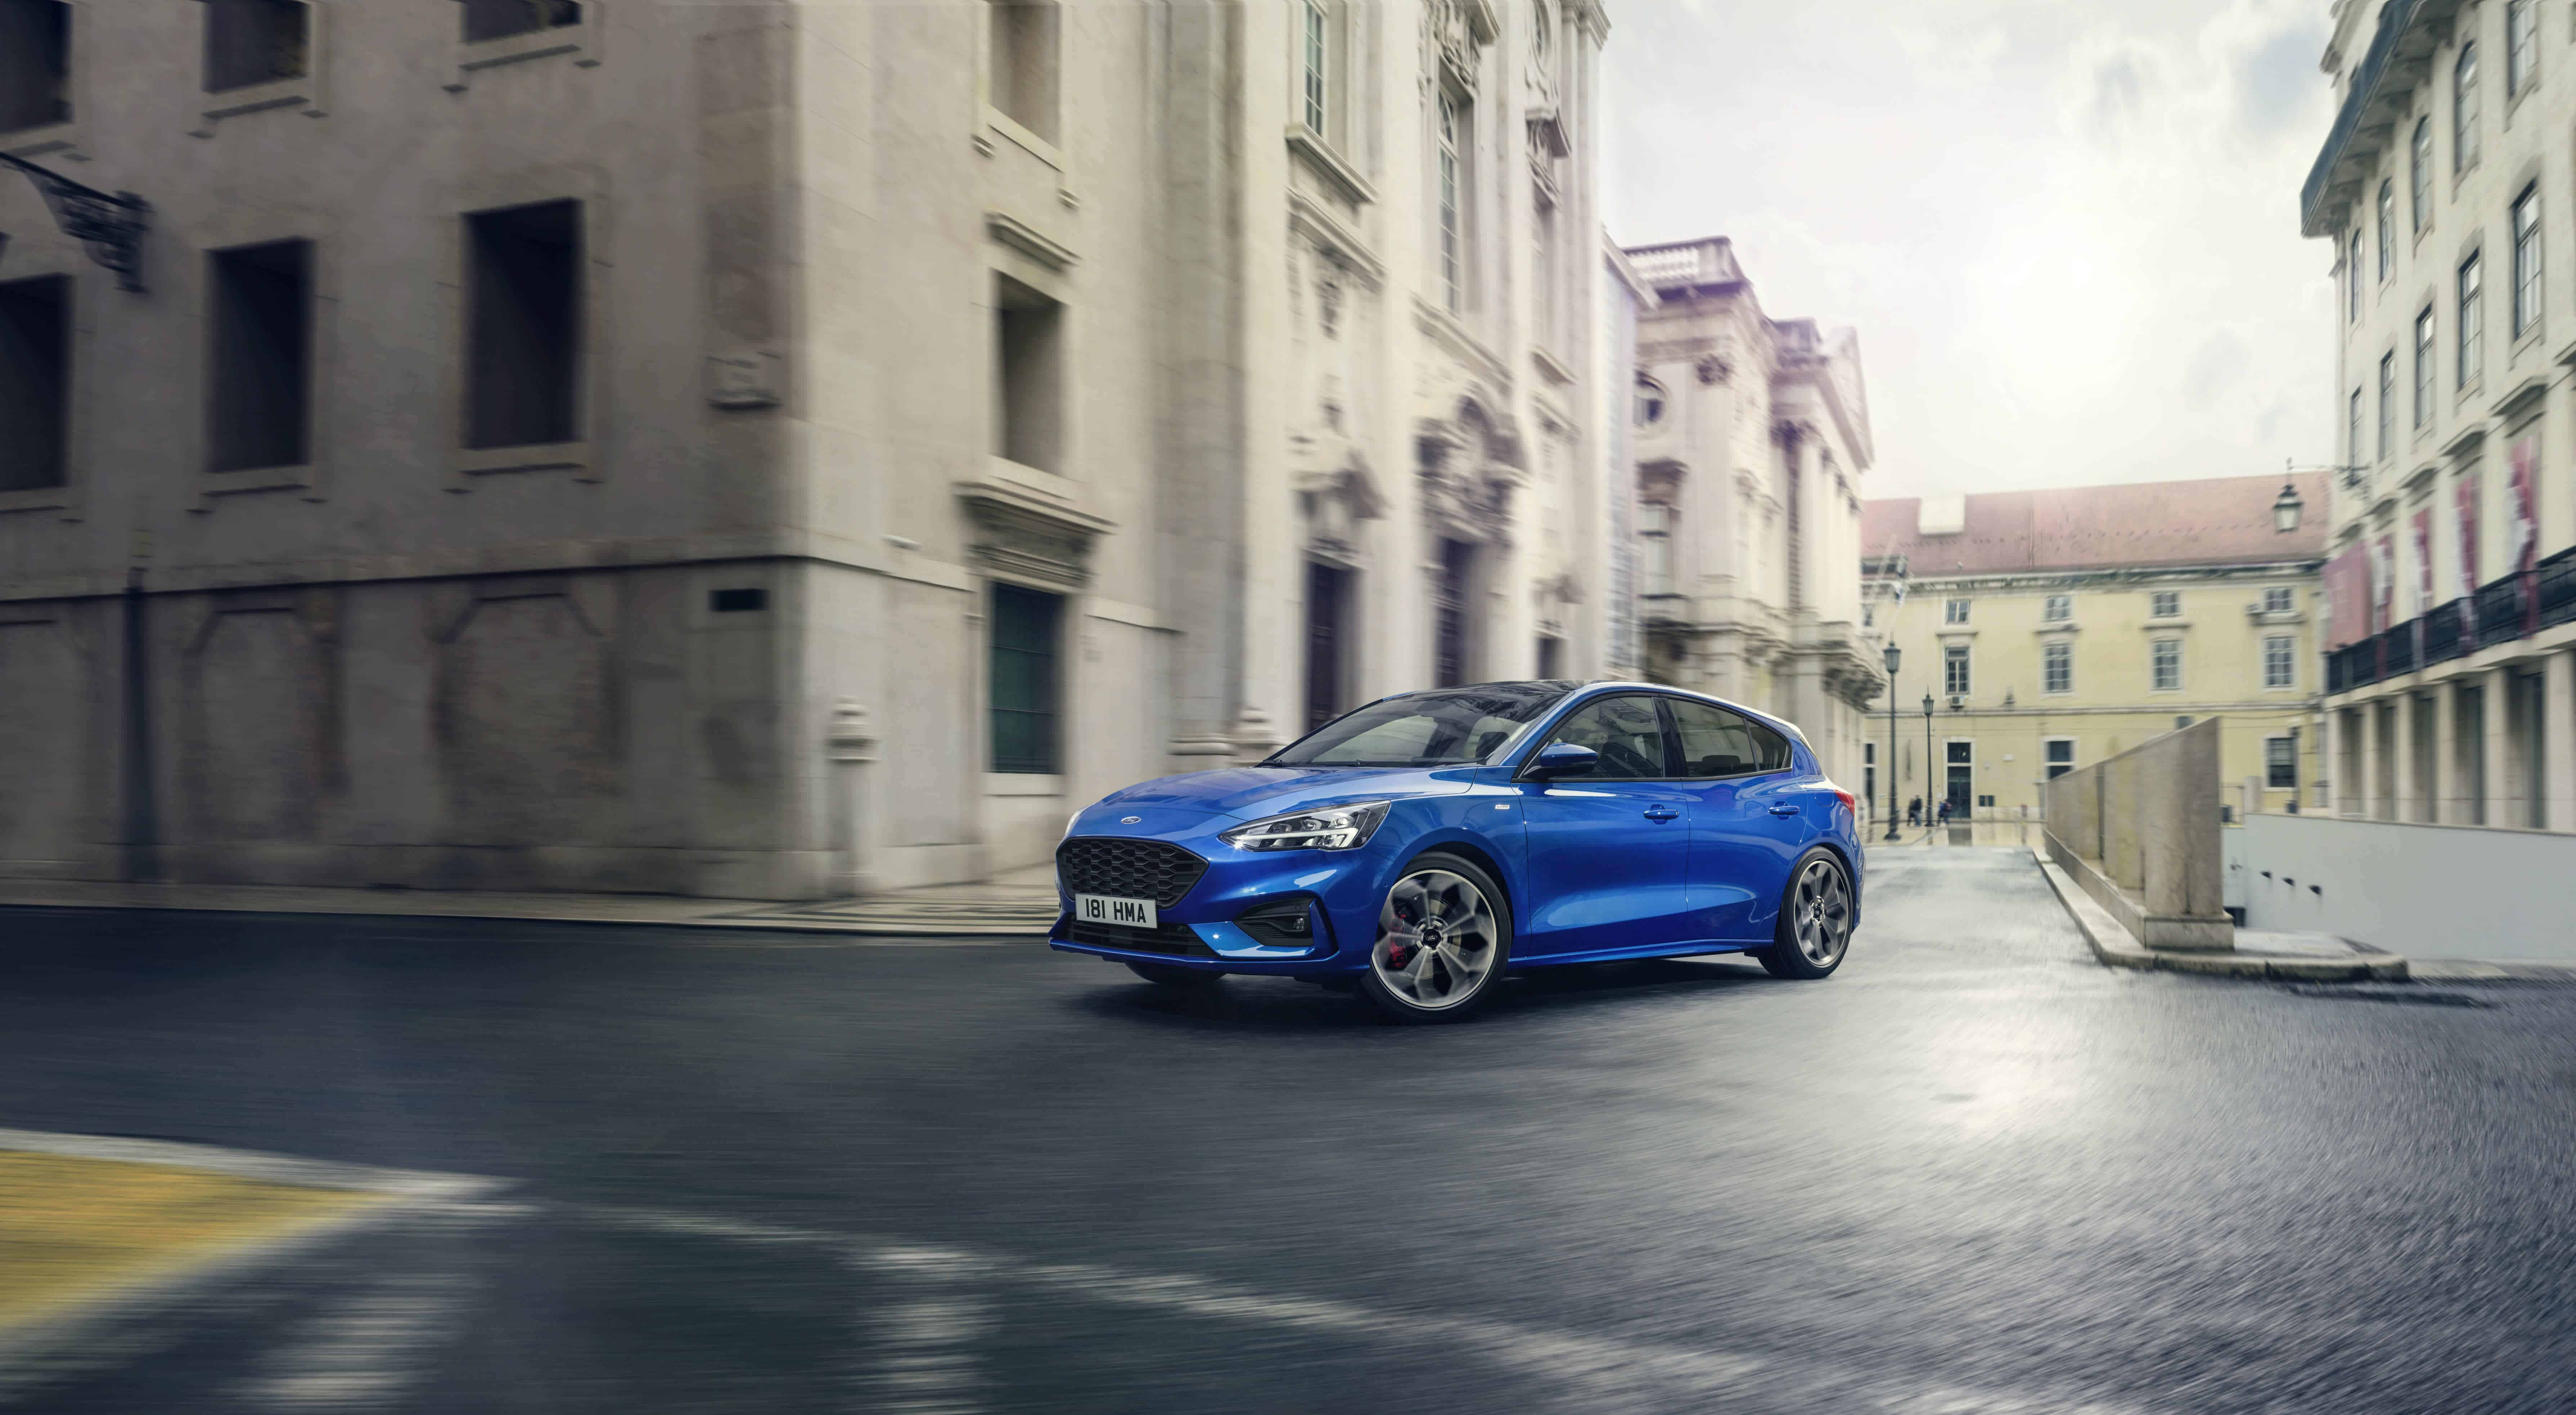 12 Ford_Focus 2018__St-Line_exterior